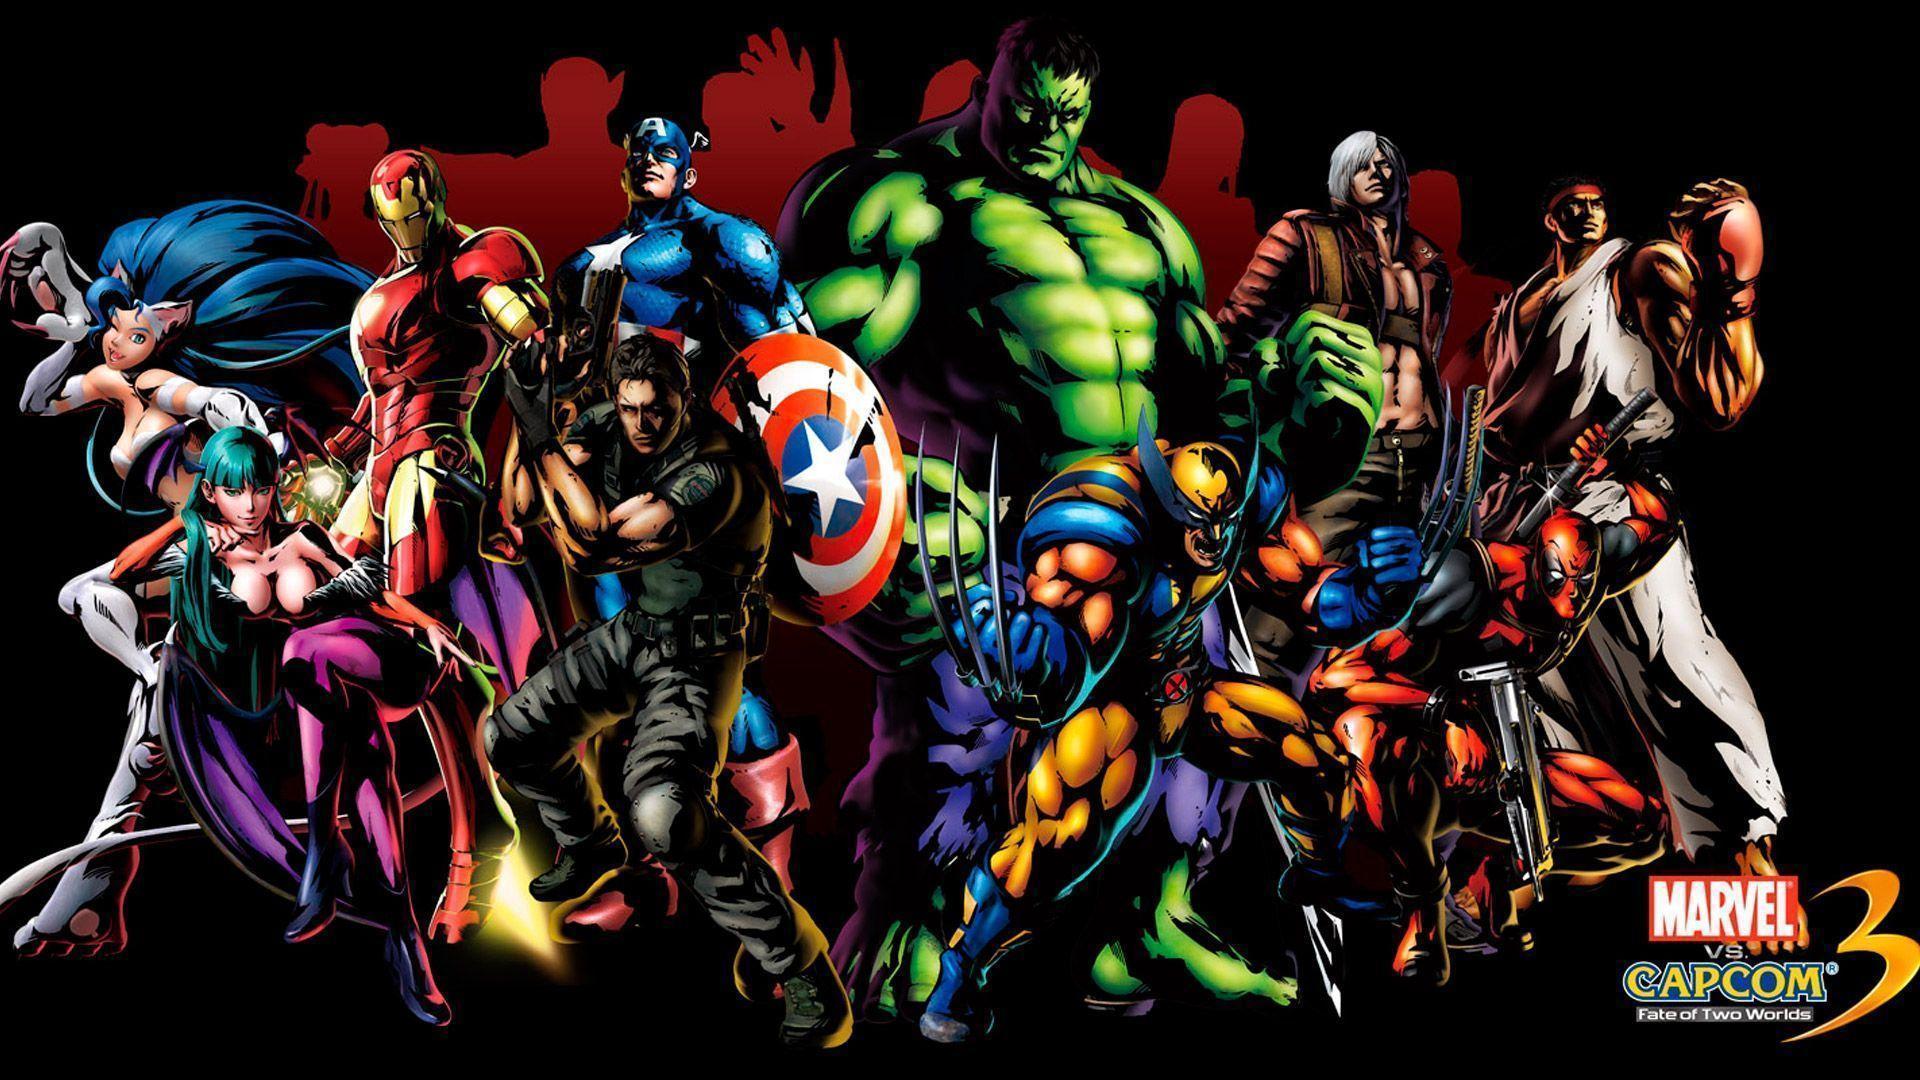 Marvel Superheroes Wallpapers - Wallpaper Cave